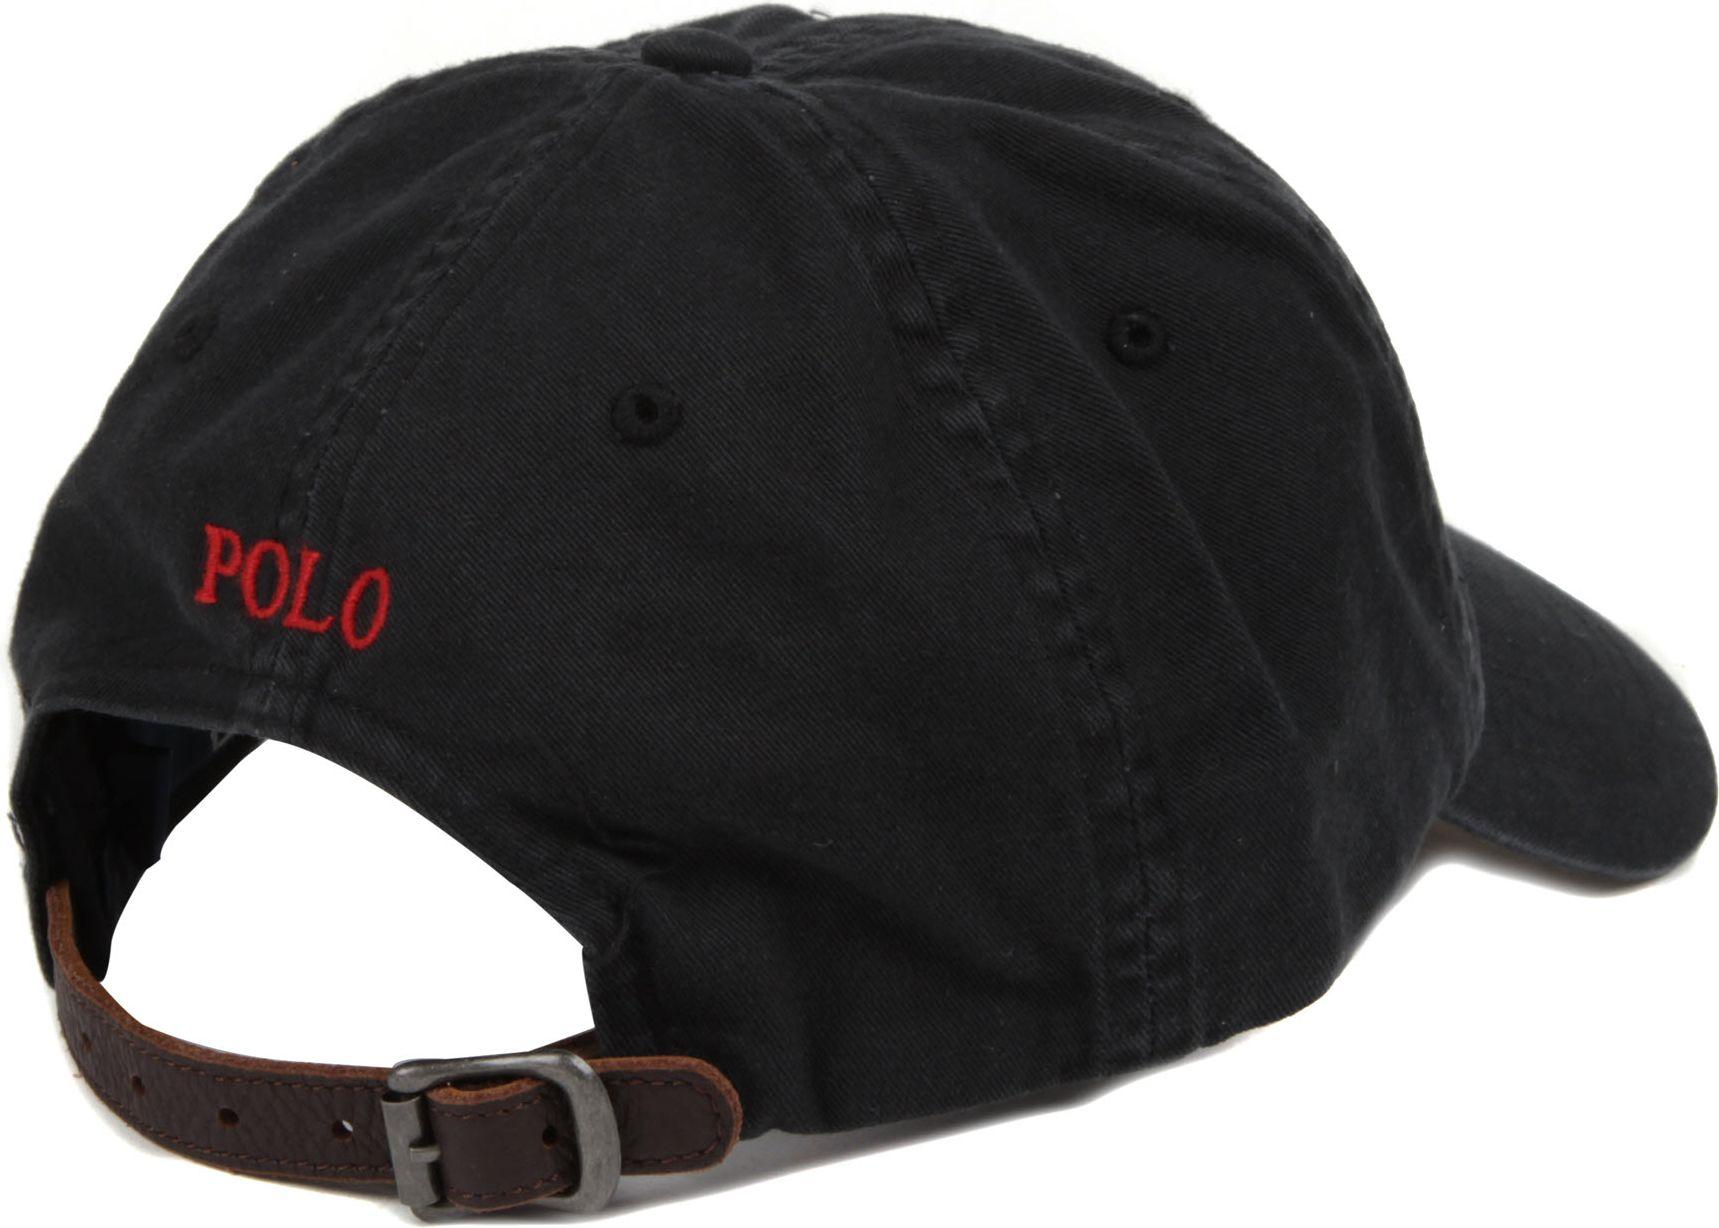 Ralph Lauren Signature pony baseball cap in Black for Men - Lyst 2ecc9f875c8